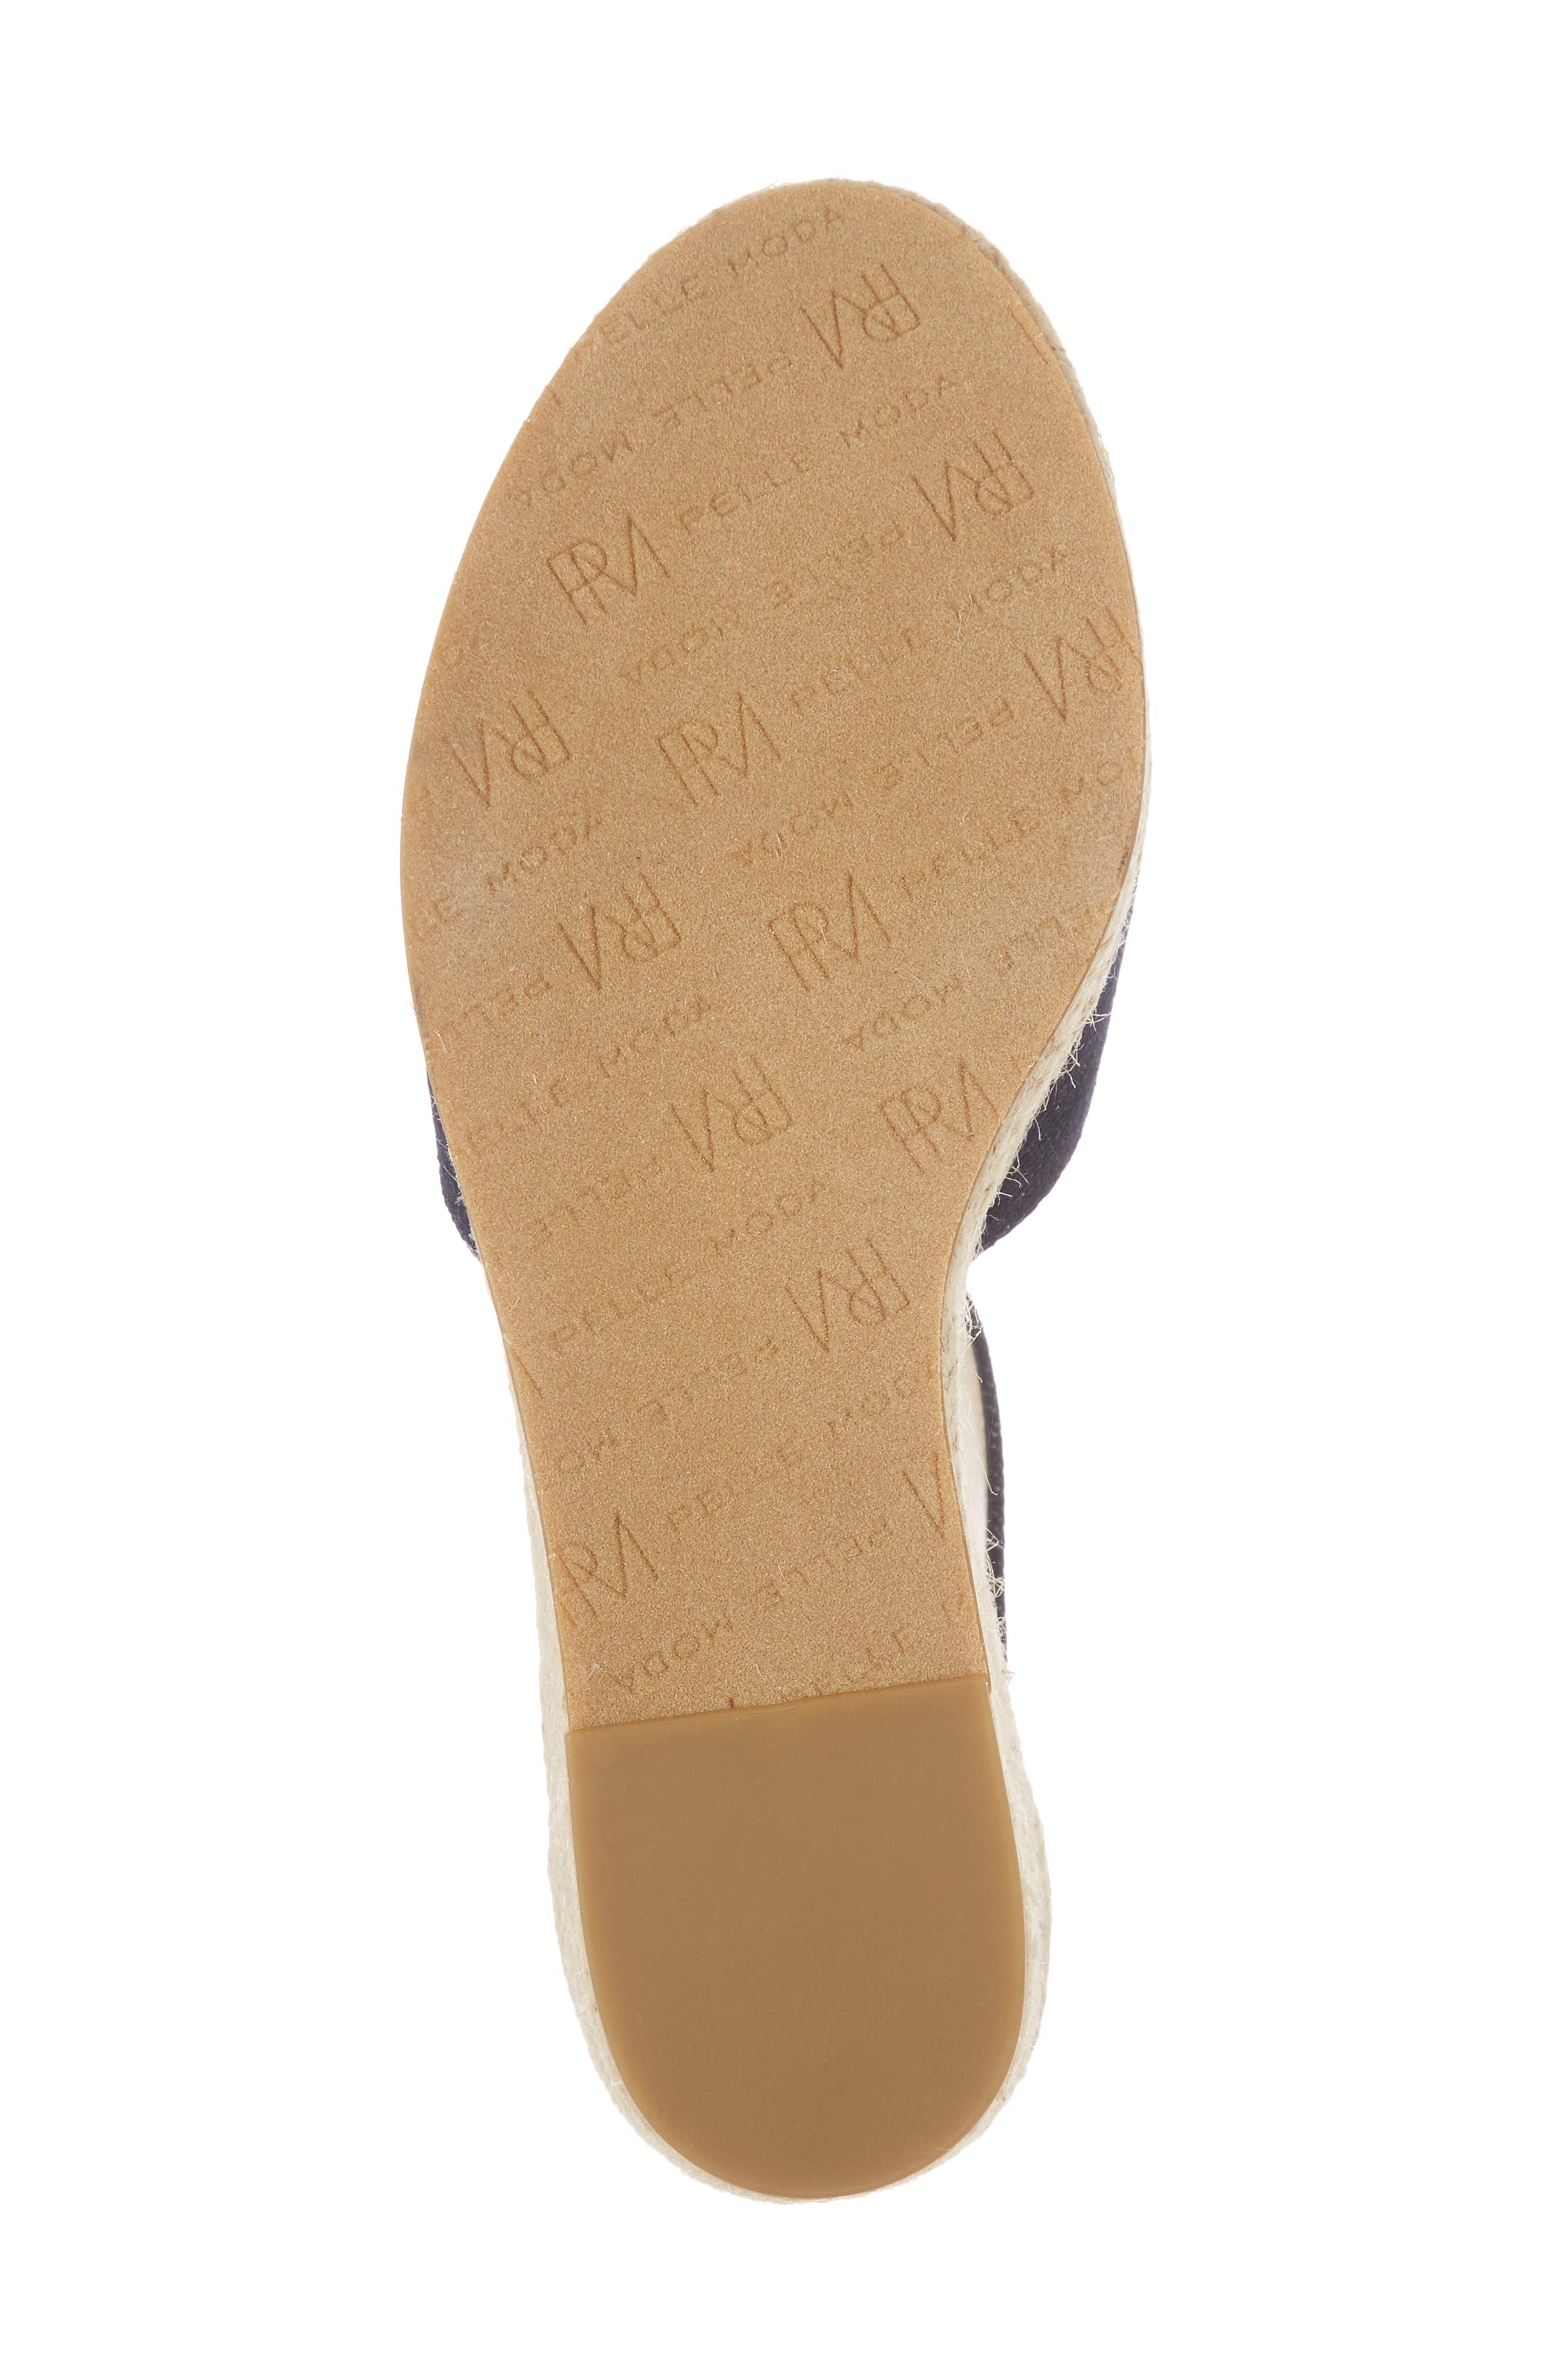 PELLE MODA, Kauai Platform Wedge Sandal, Alternate thumbnail 6, color, INDIGO